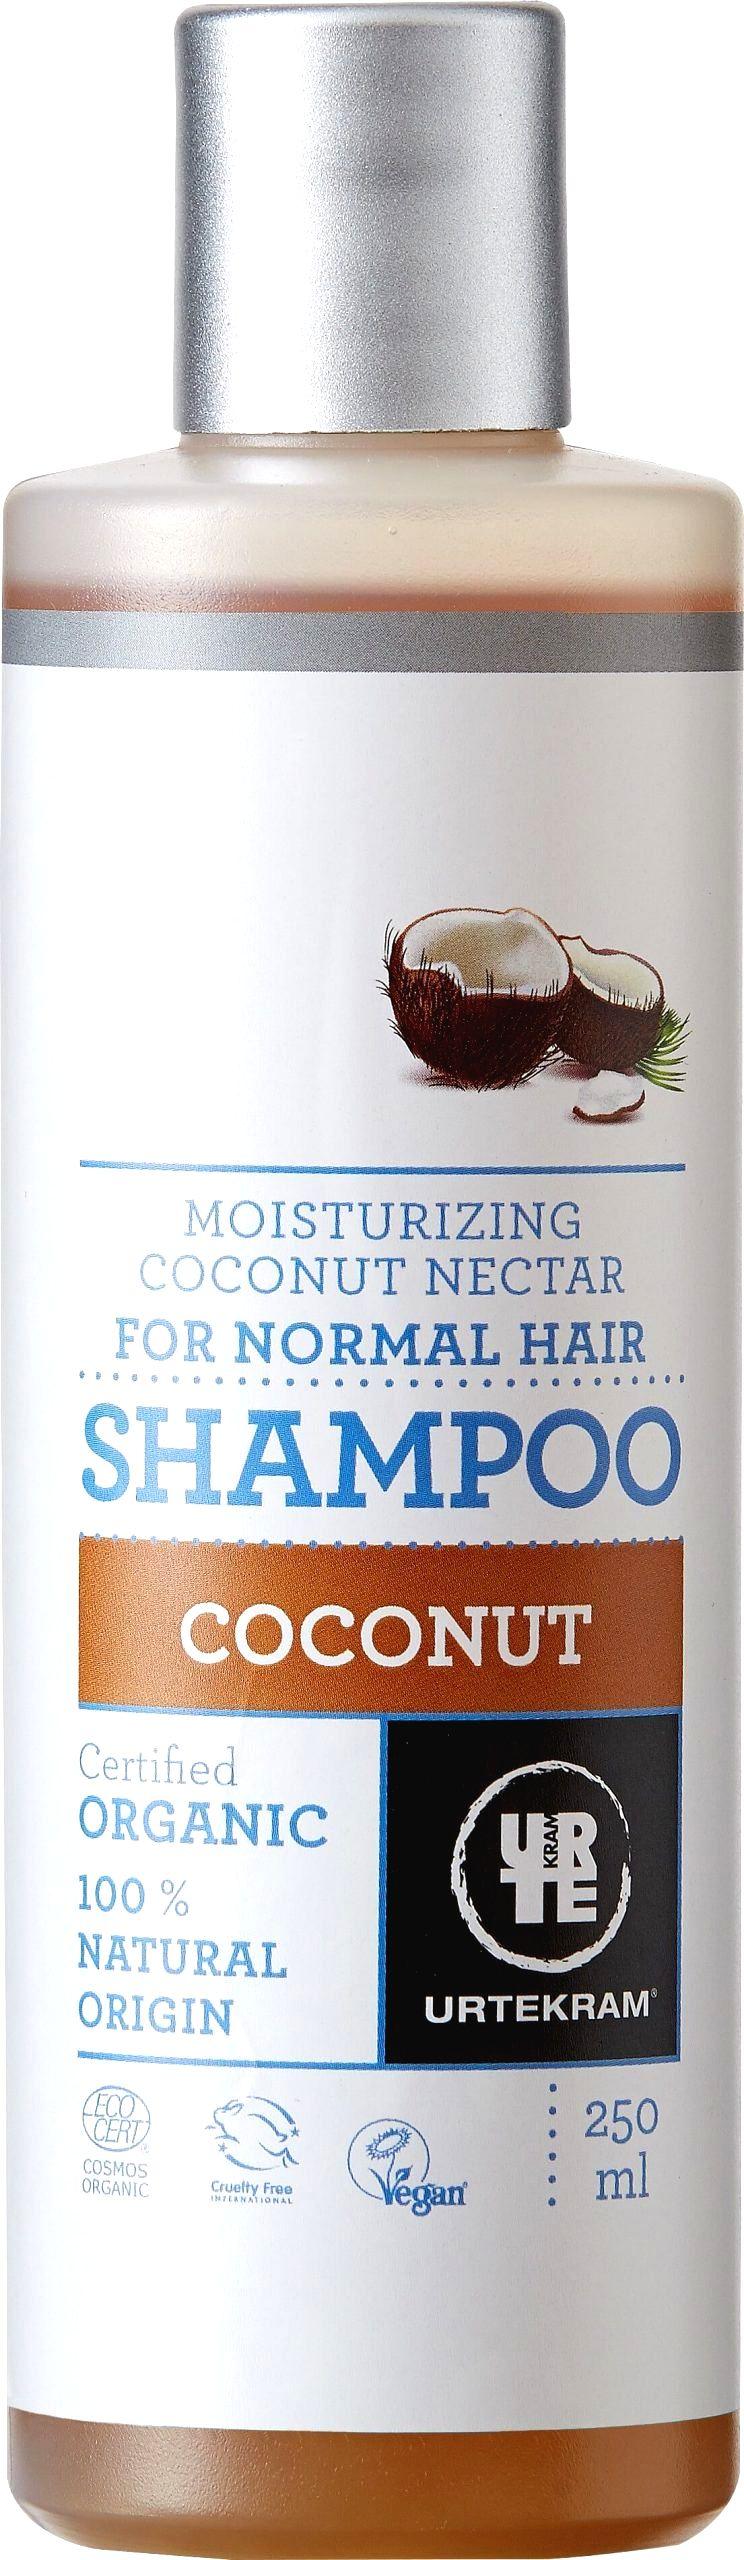 Urtekram Šampón kokosový 250 ml BIO